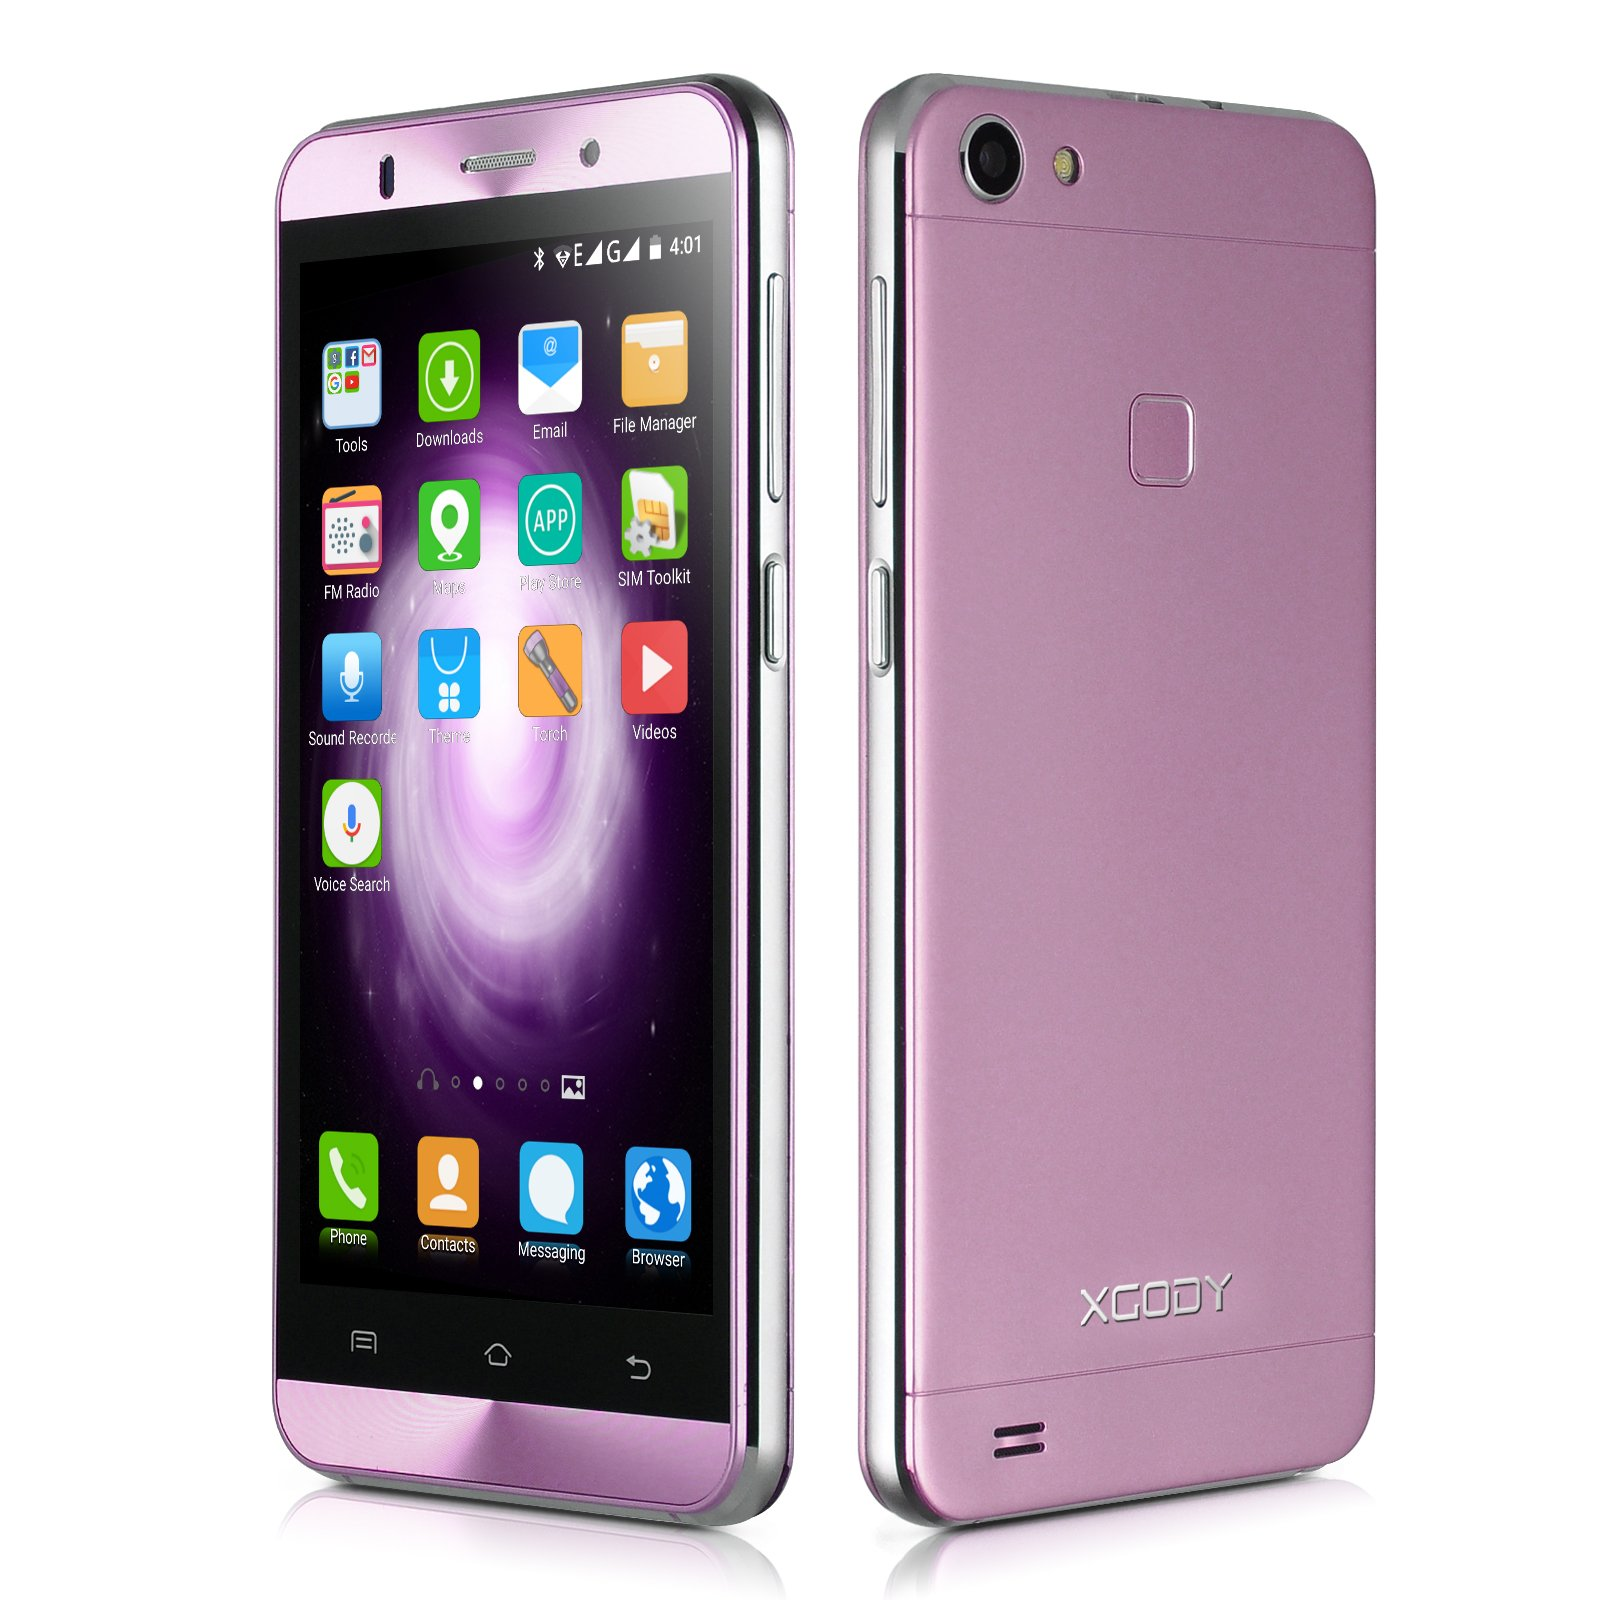 Xgody X15s Unlocked Smartphones Android 5.1 Dual Sim 3G 5 Inch Quad Core qHD Screen ROM 8GB Dual Camera 5.0MP with Wi-Fi GPS Bluetooth Celulares Pink